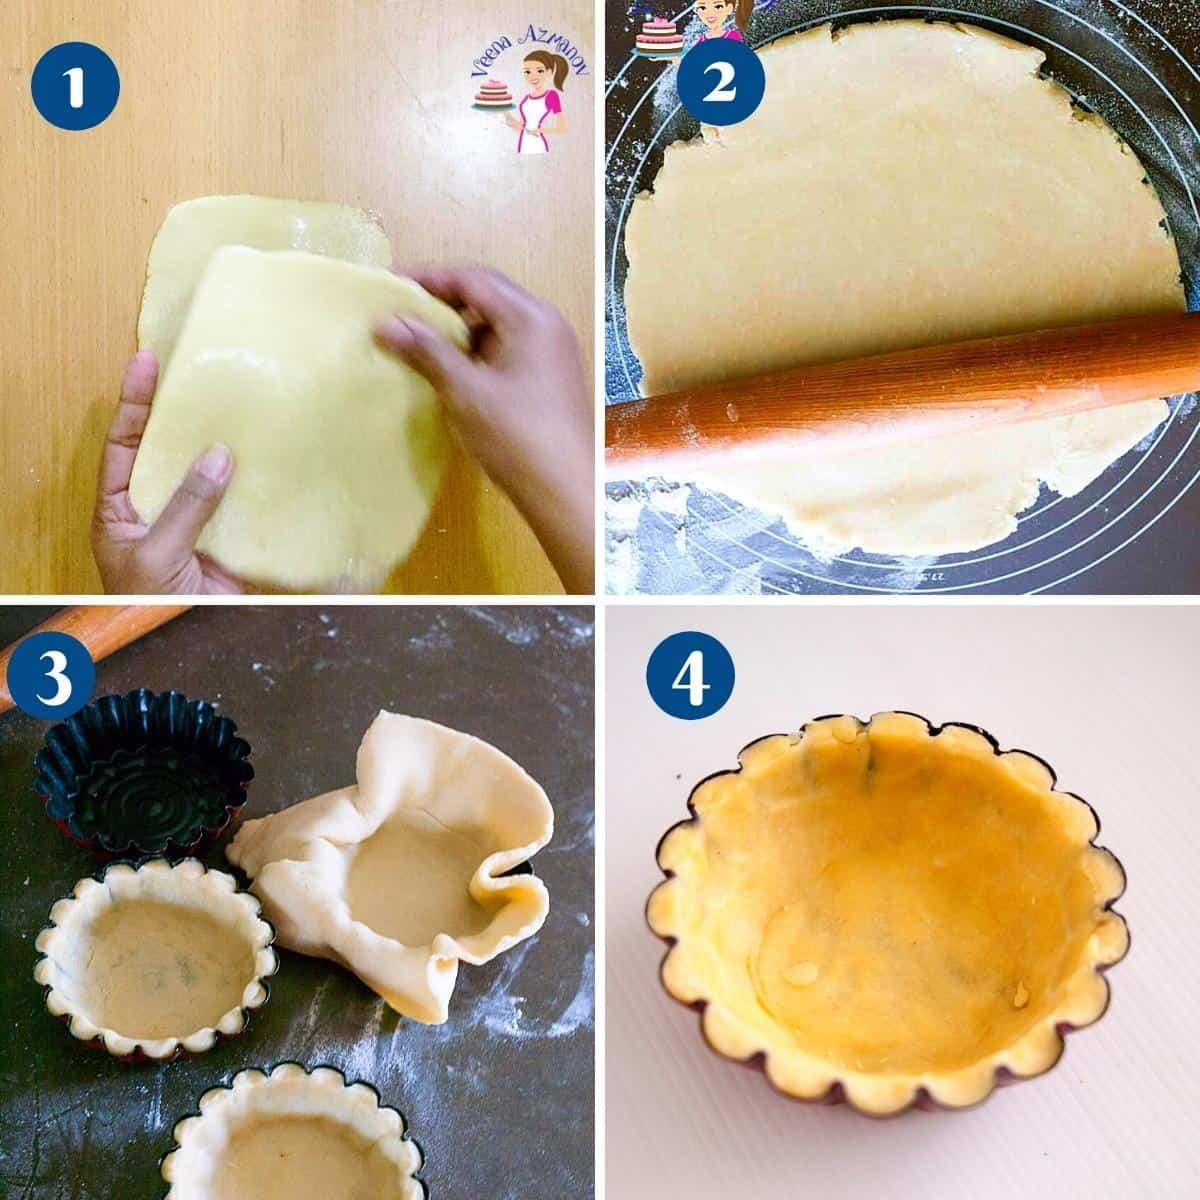 Progress Pictures - Tartlet Shells Method 3 alternate method.